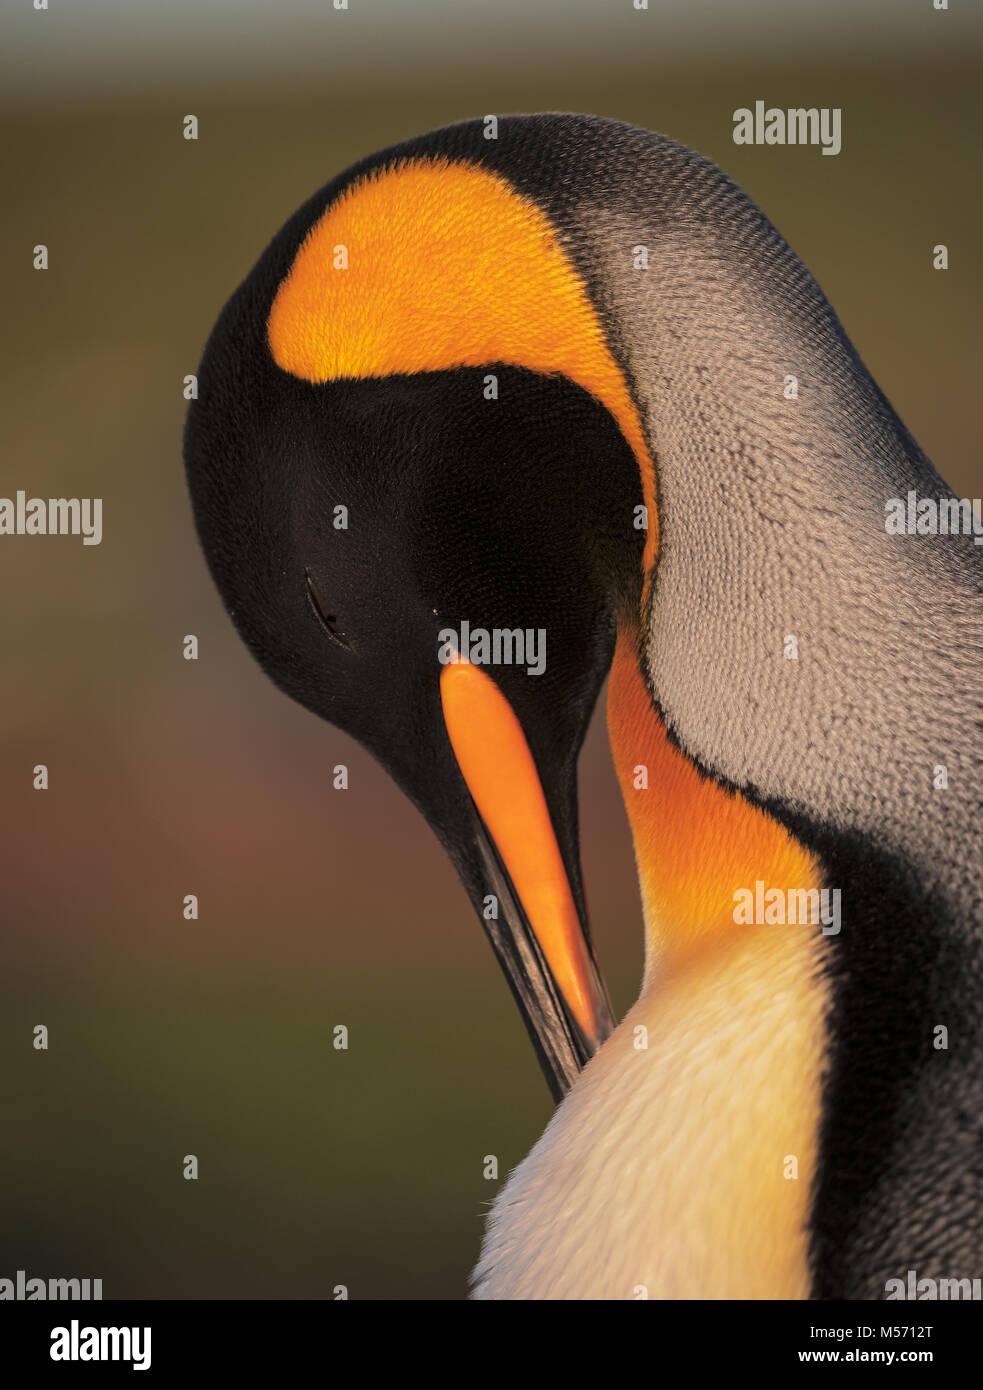 King Penguin portrait - Stock Image